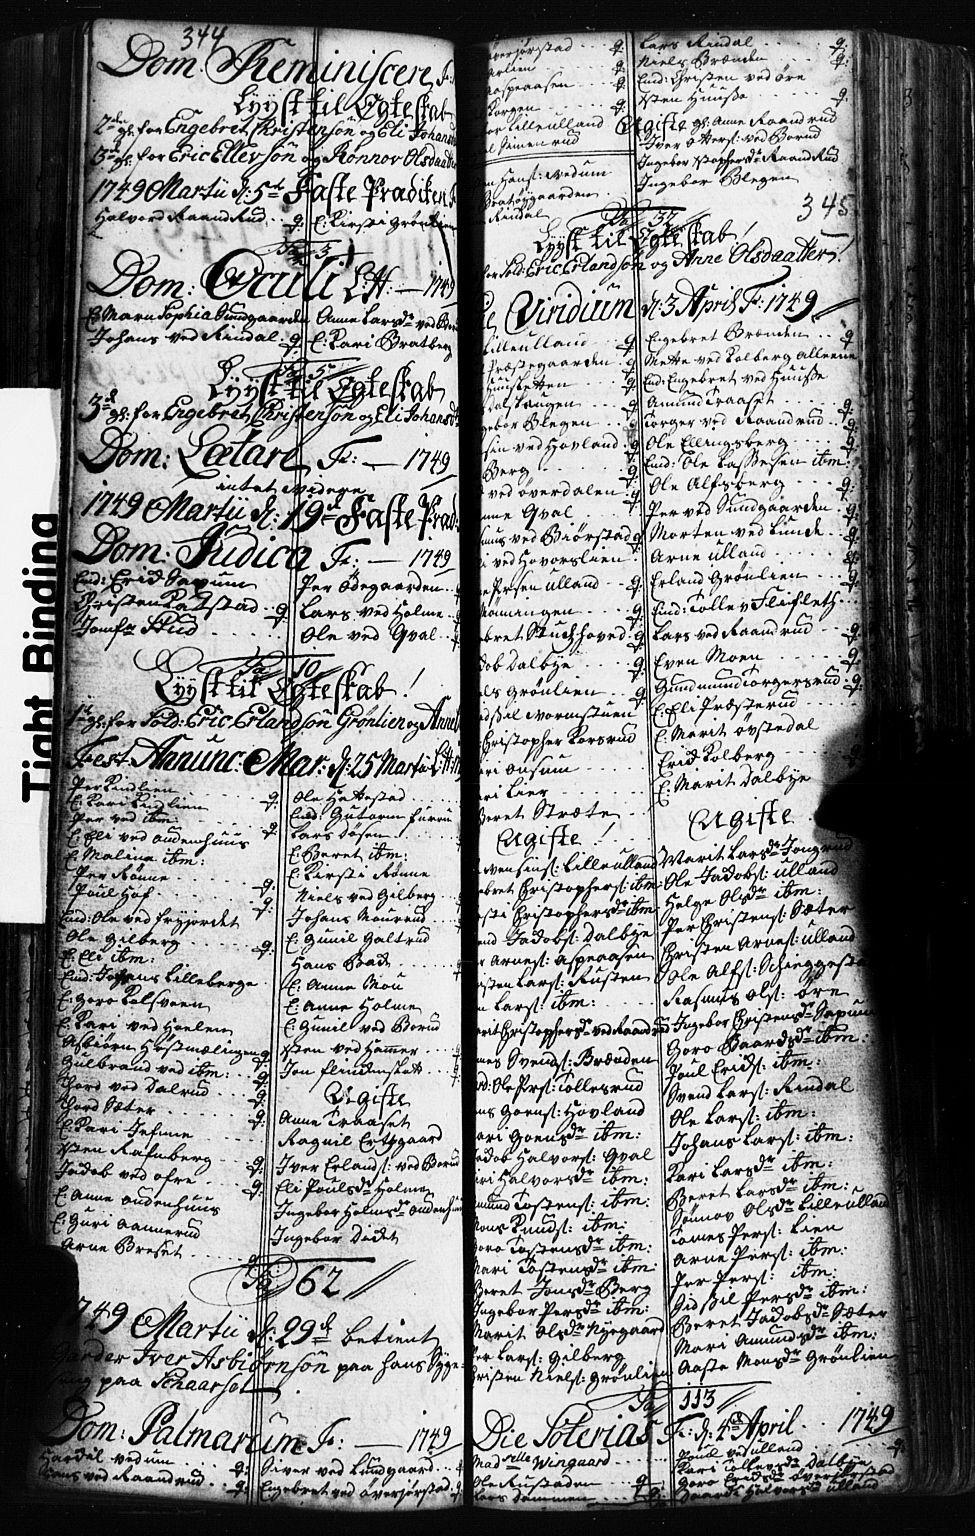 SAH, Fåberg prestekontor, Klokkerbok nr. 2, 1741-1756, s. 344-345